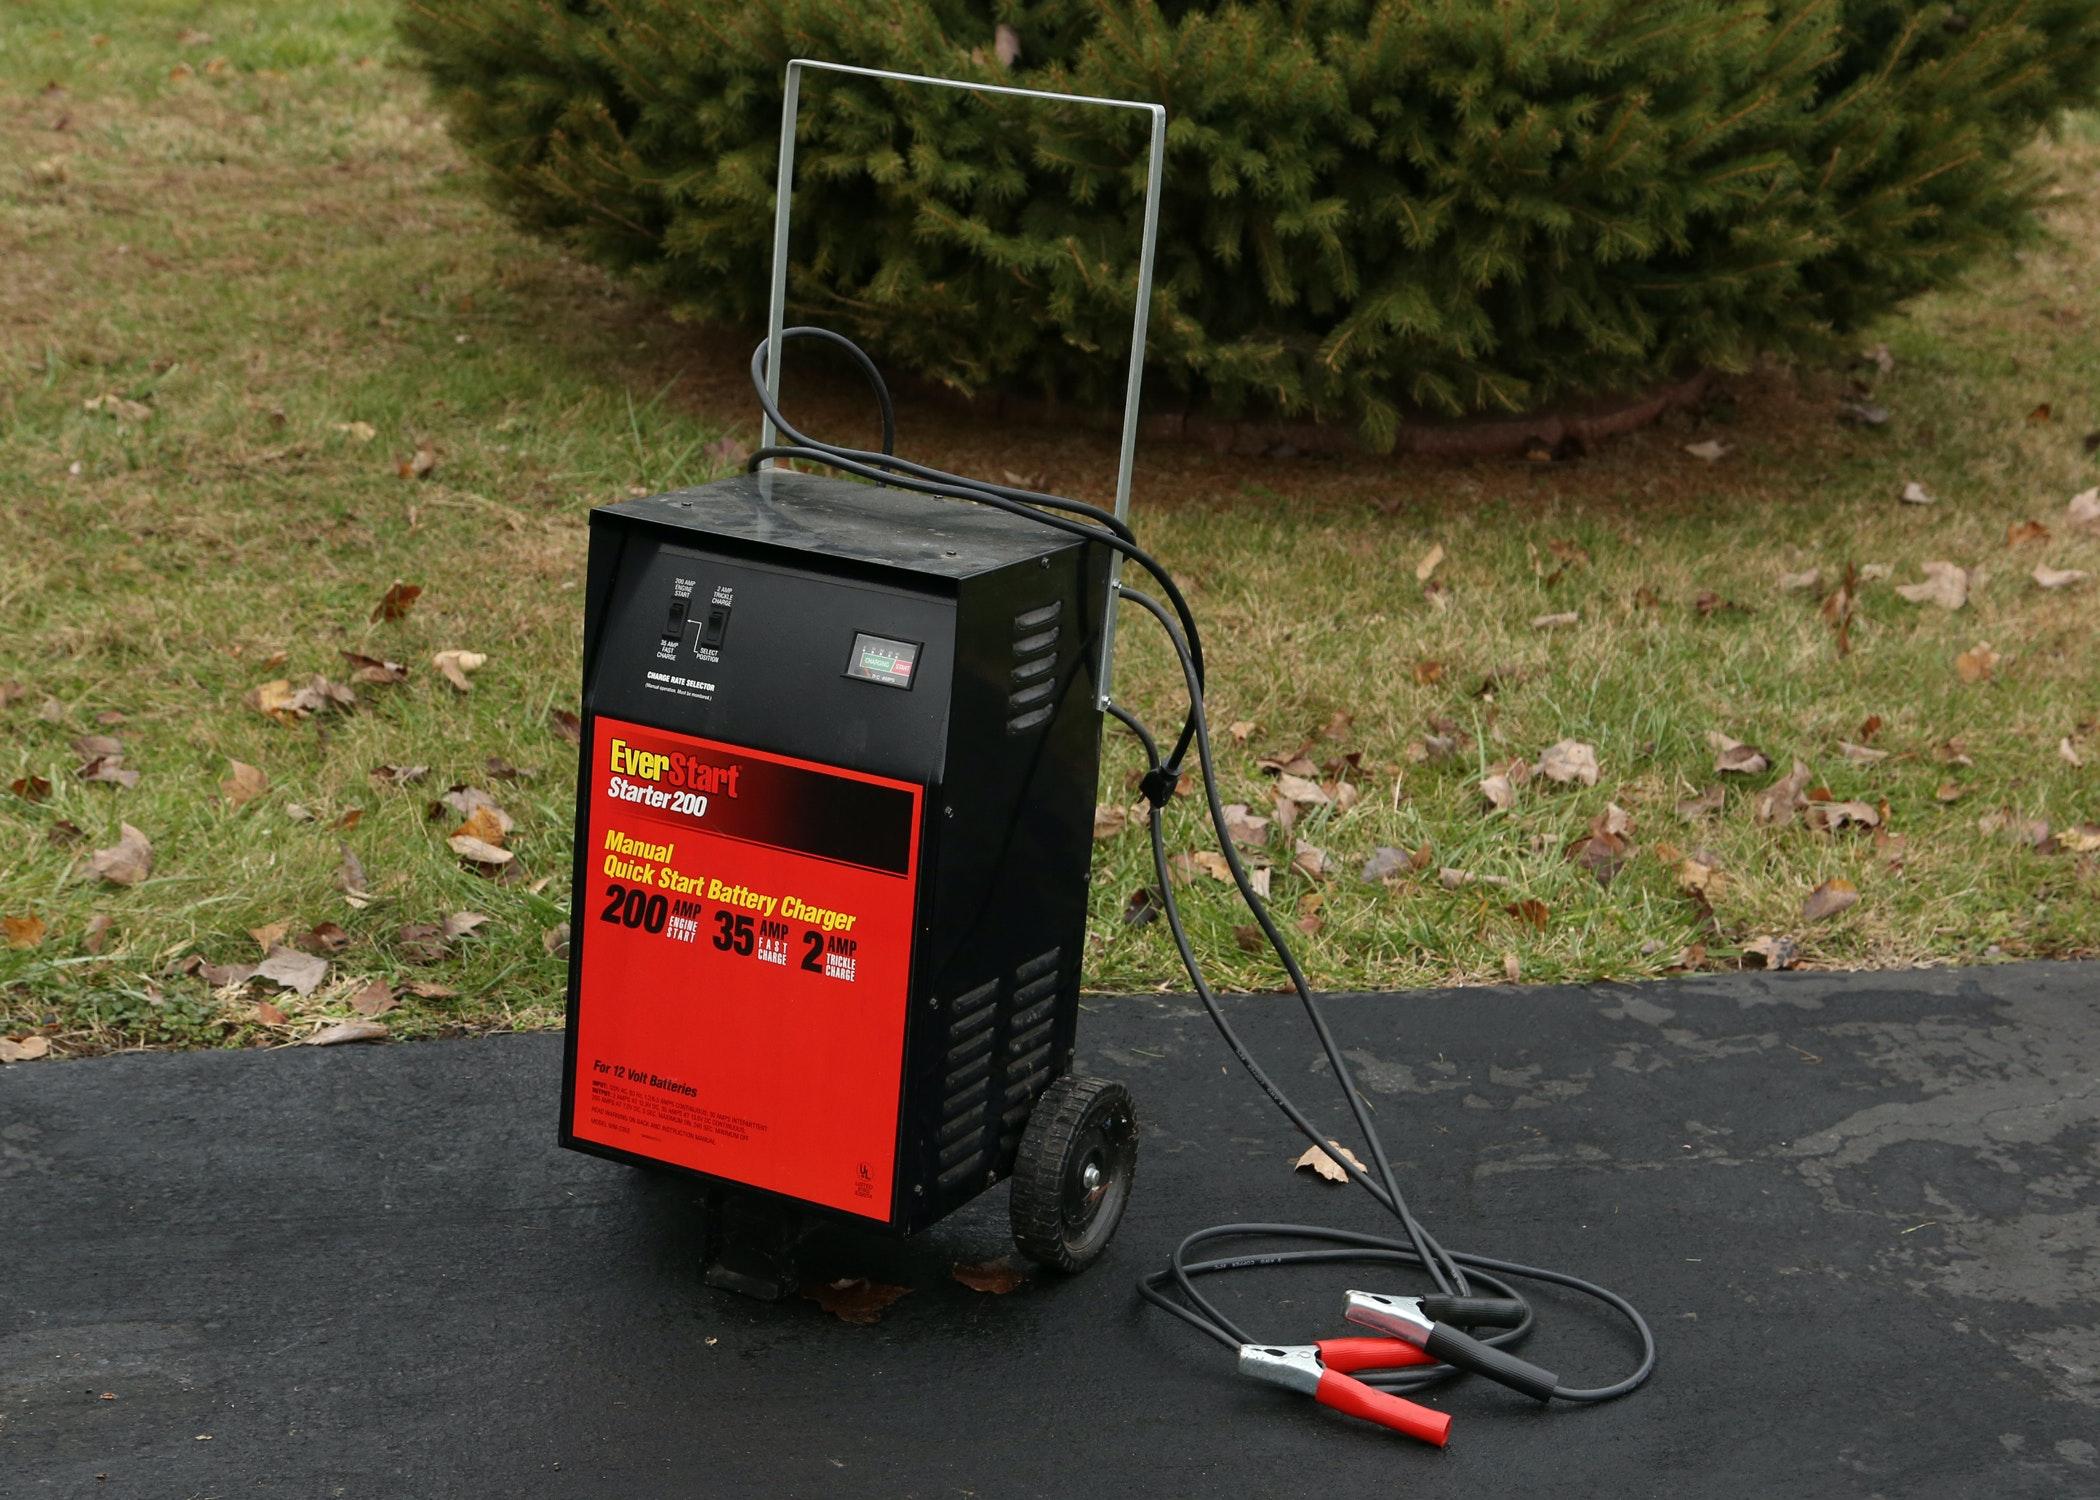 Ever Start 200 Battery Charger Ebth